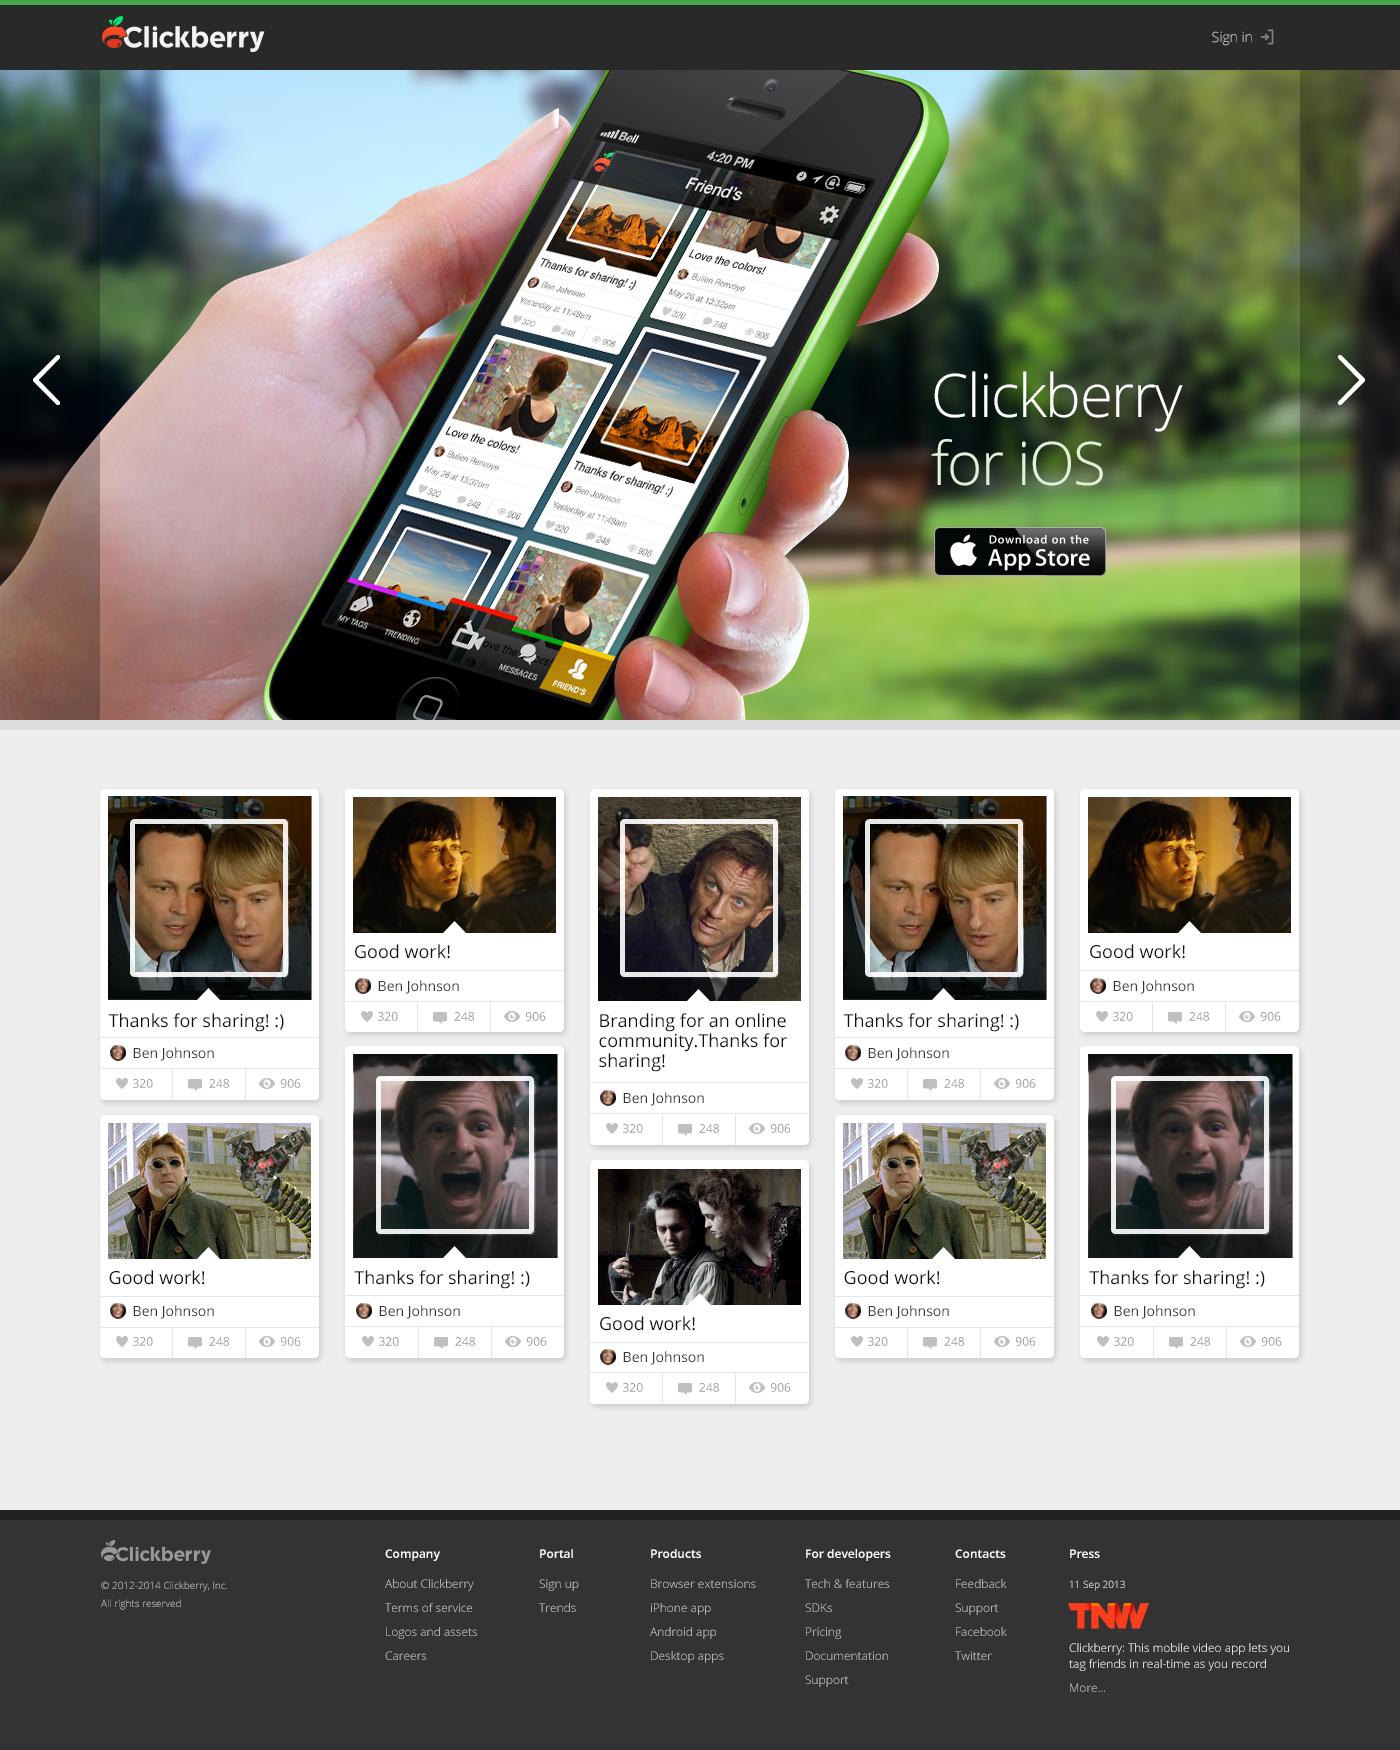 clickberry_portal2